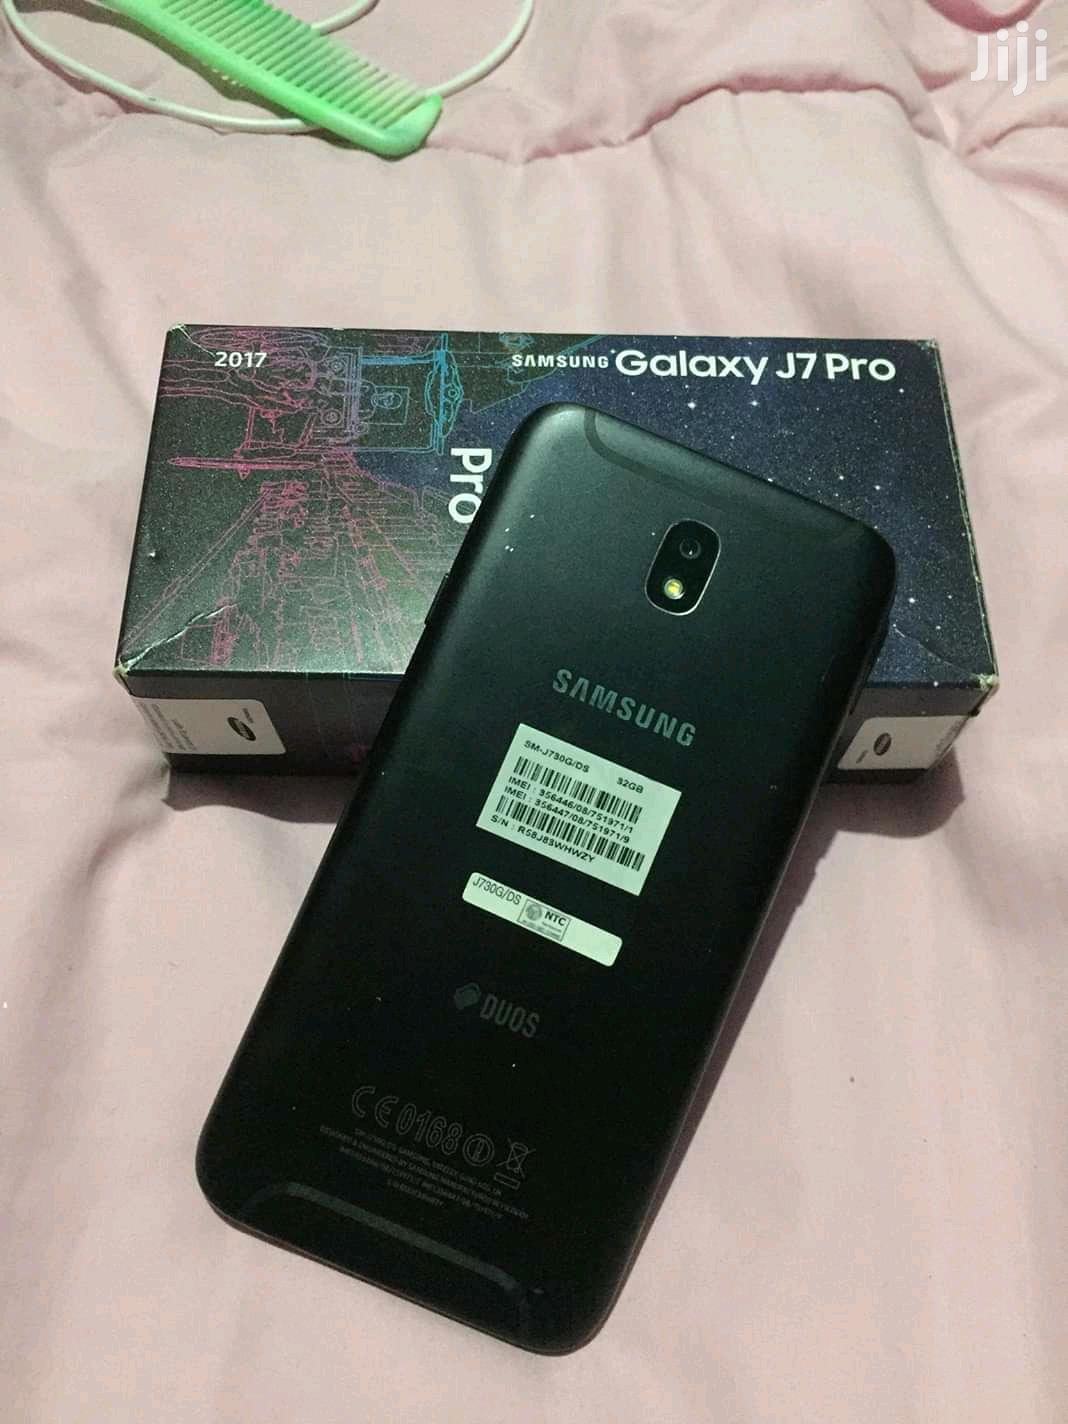 New Samsung Galaxy J7 Pro 32 GB Black   Mobile Phones for sale in Kumasi Metropolitan, Ashanti, Ghana